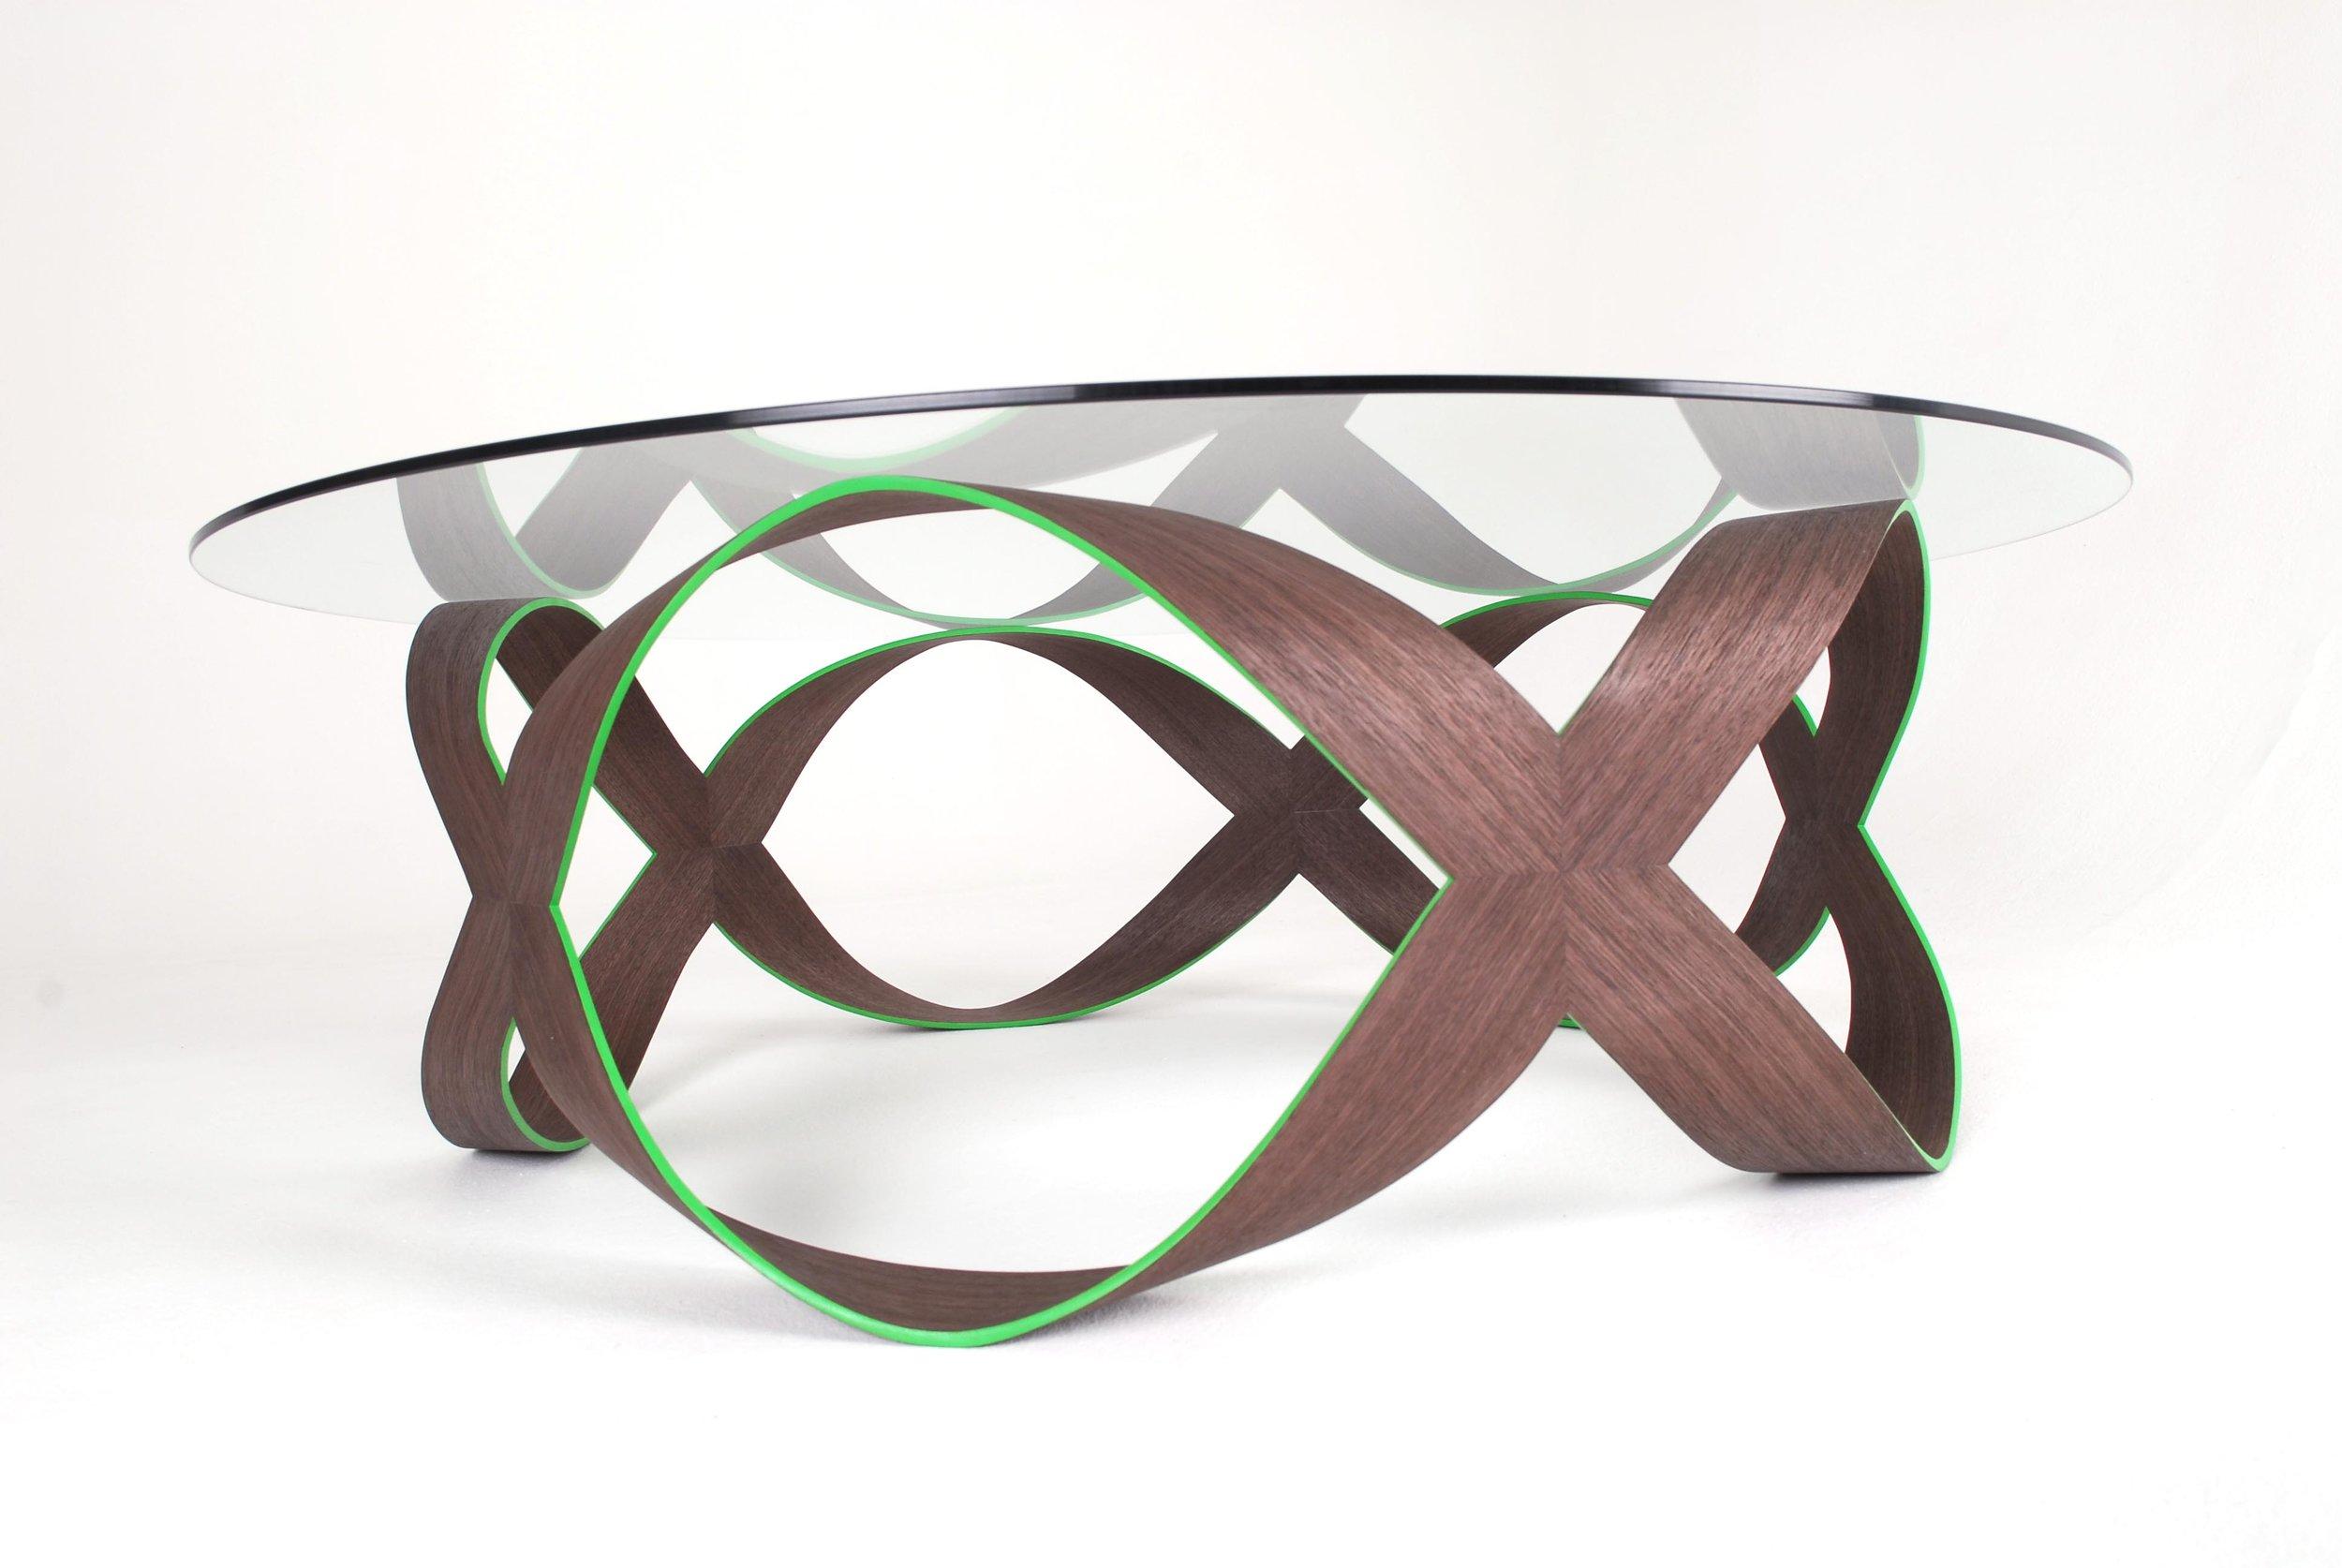 H. 'Infinity + 1-Jason Heap Furniture.jpg